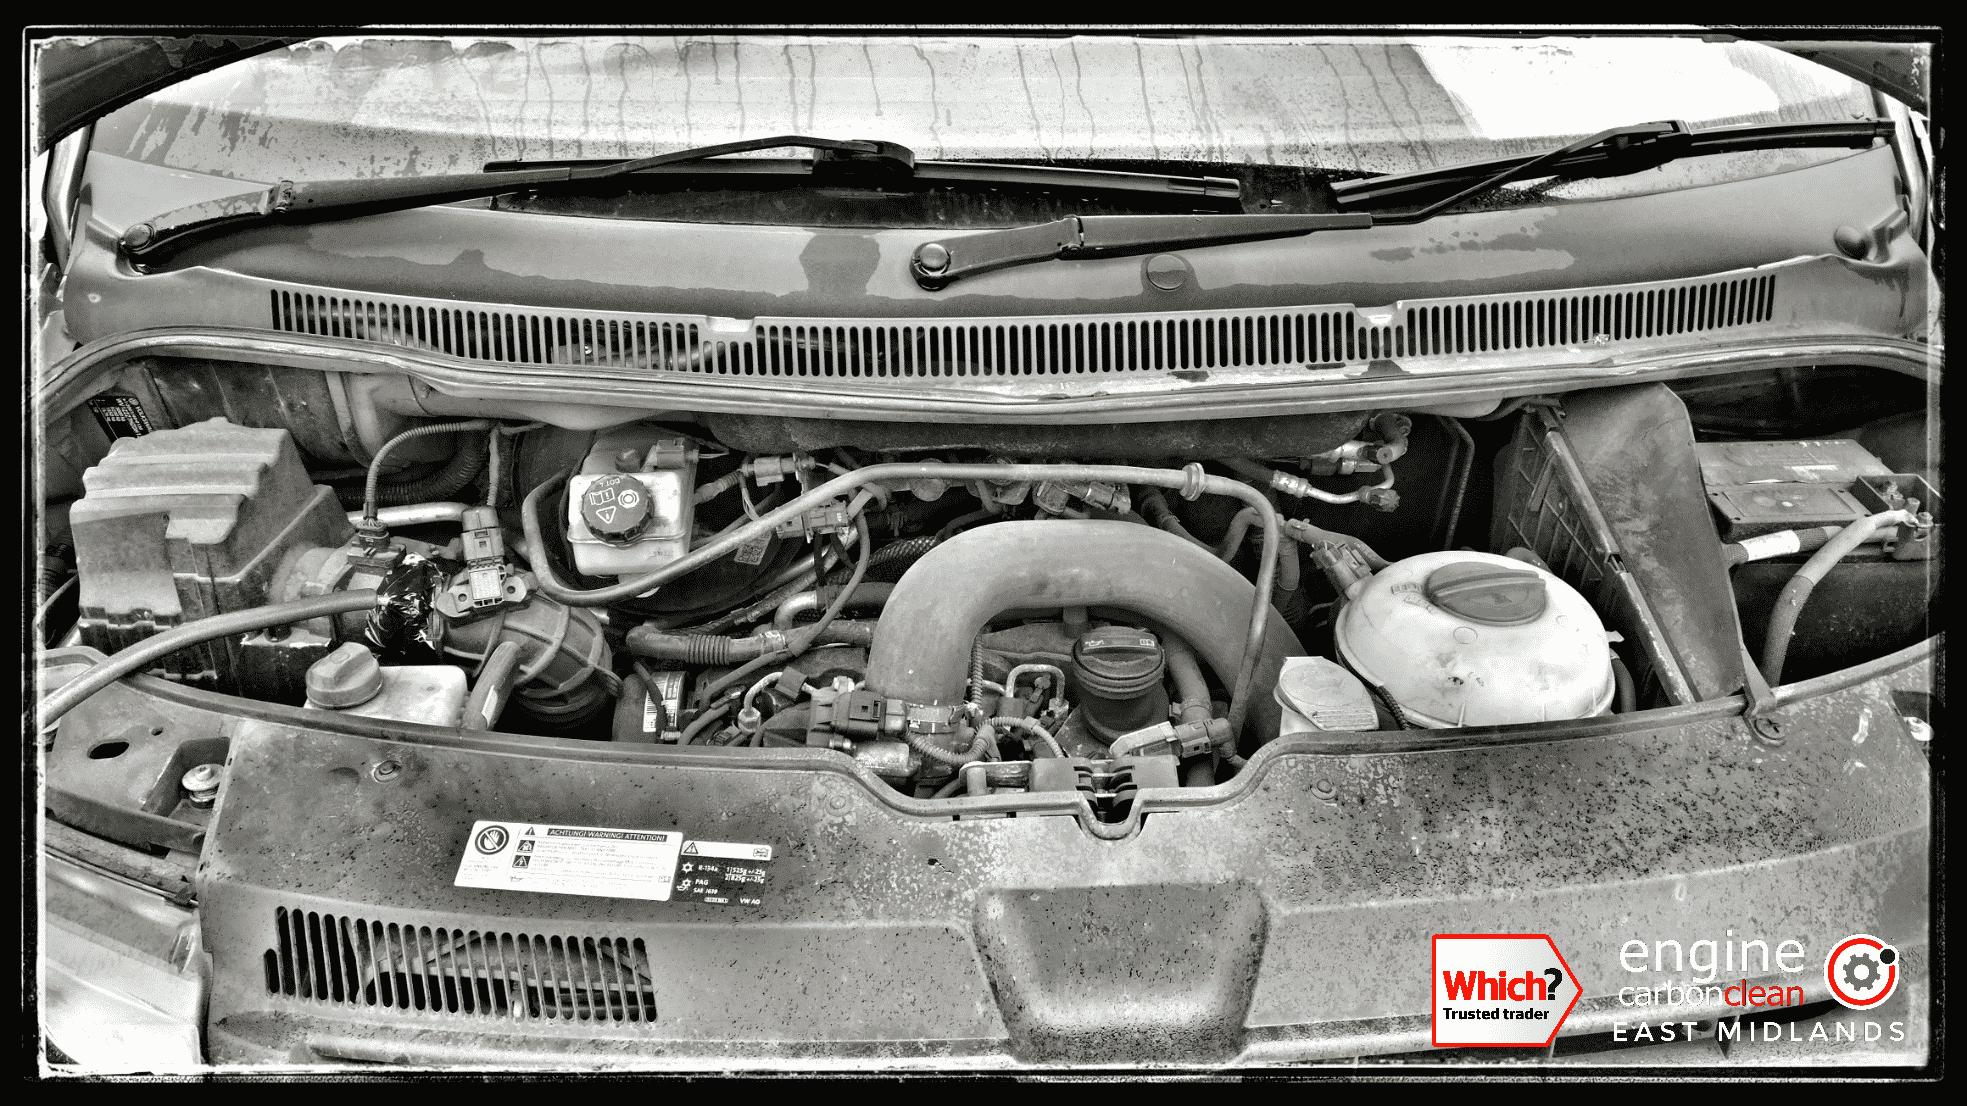 VW Transporter (2013 - 95,237 miles)